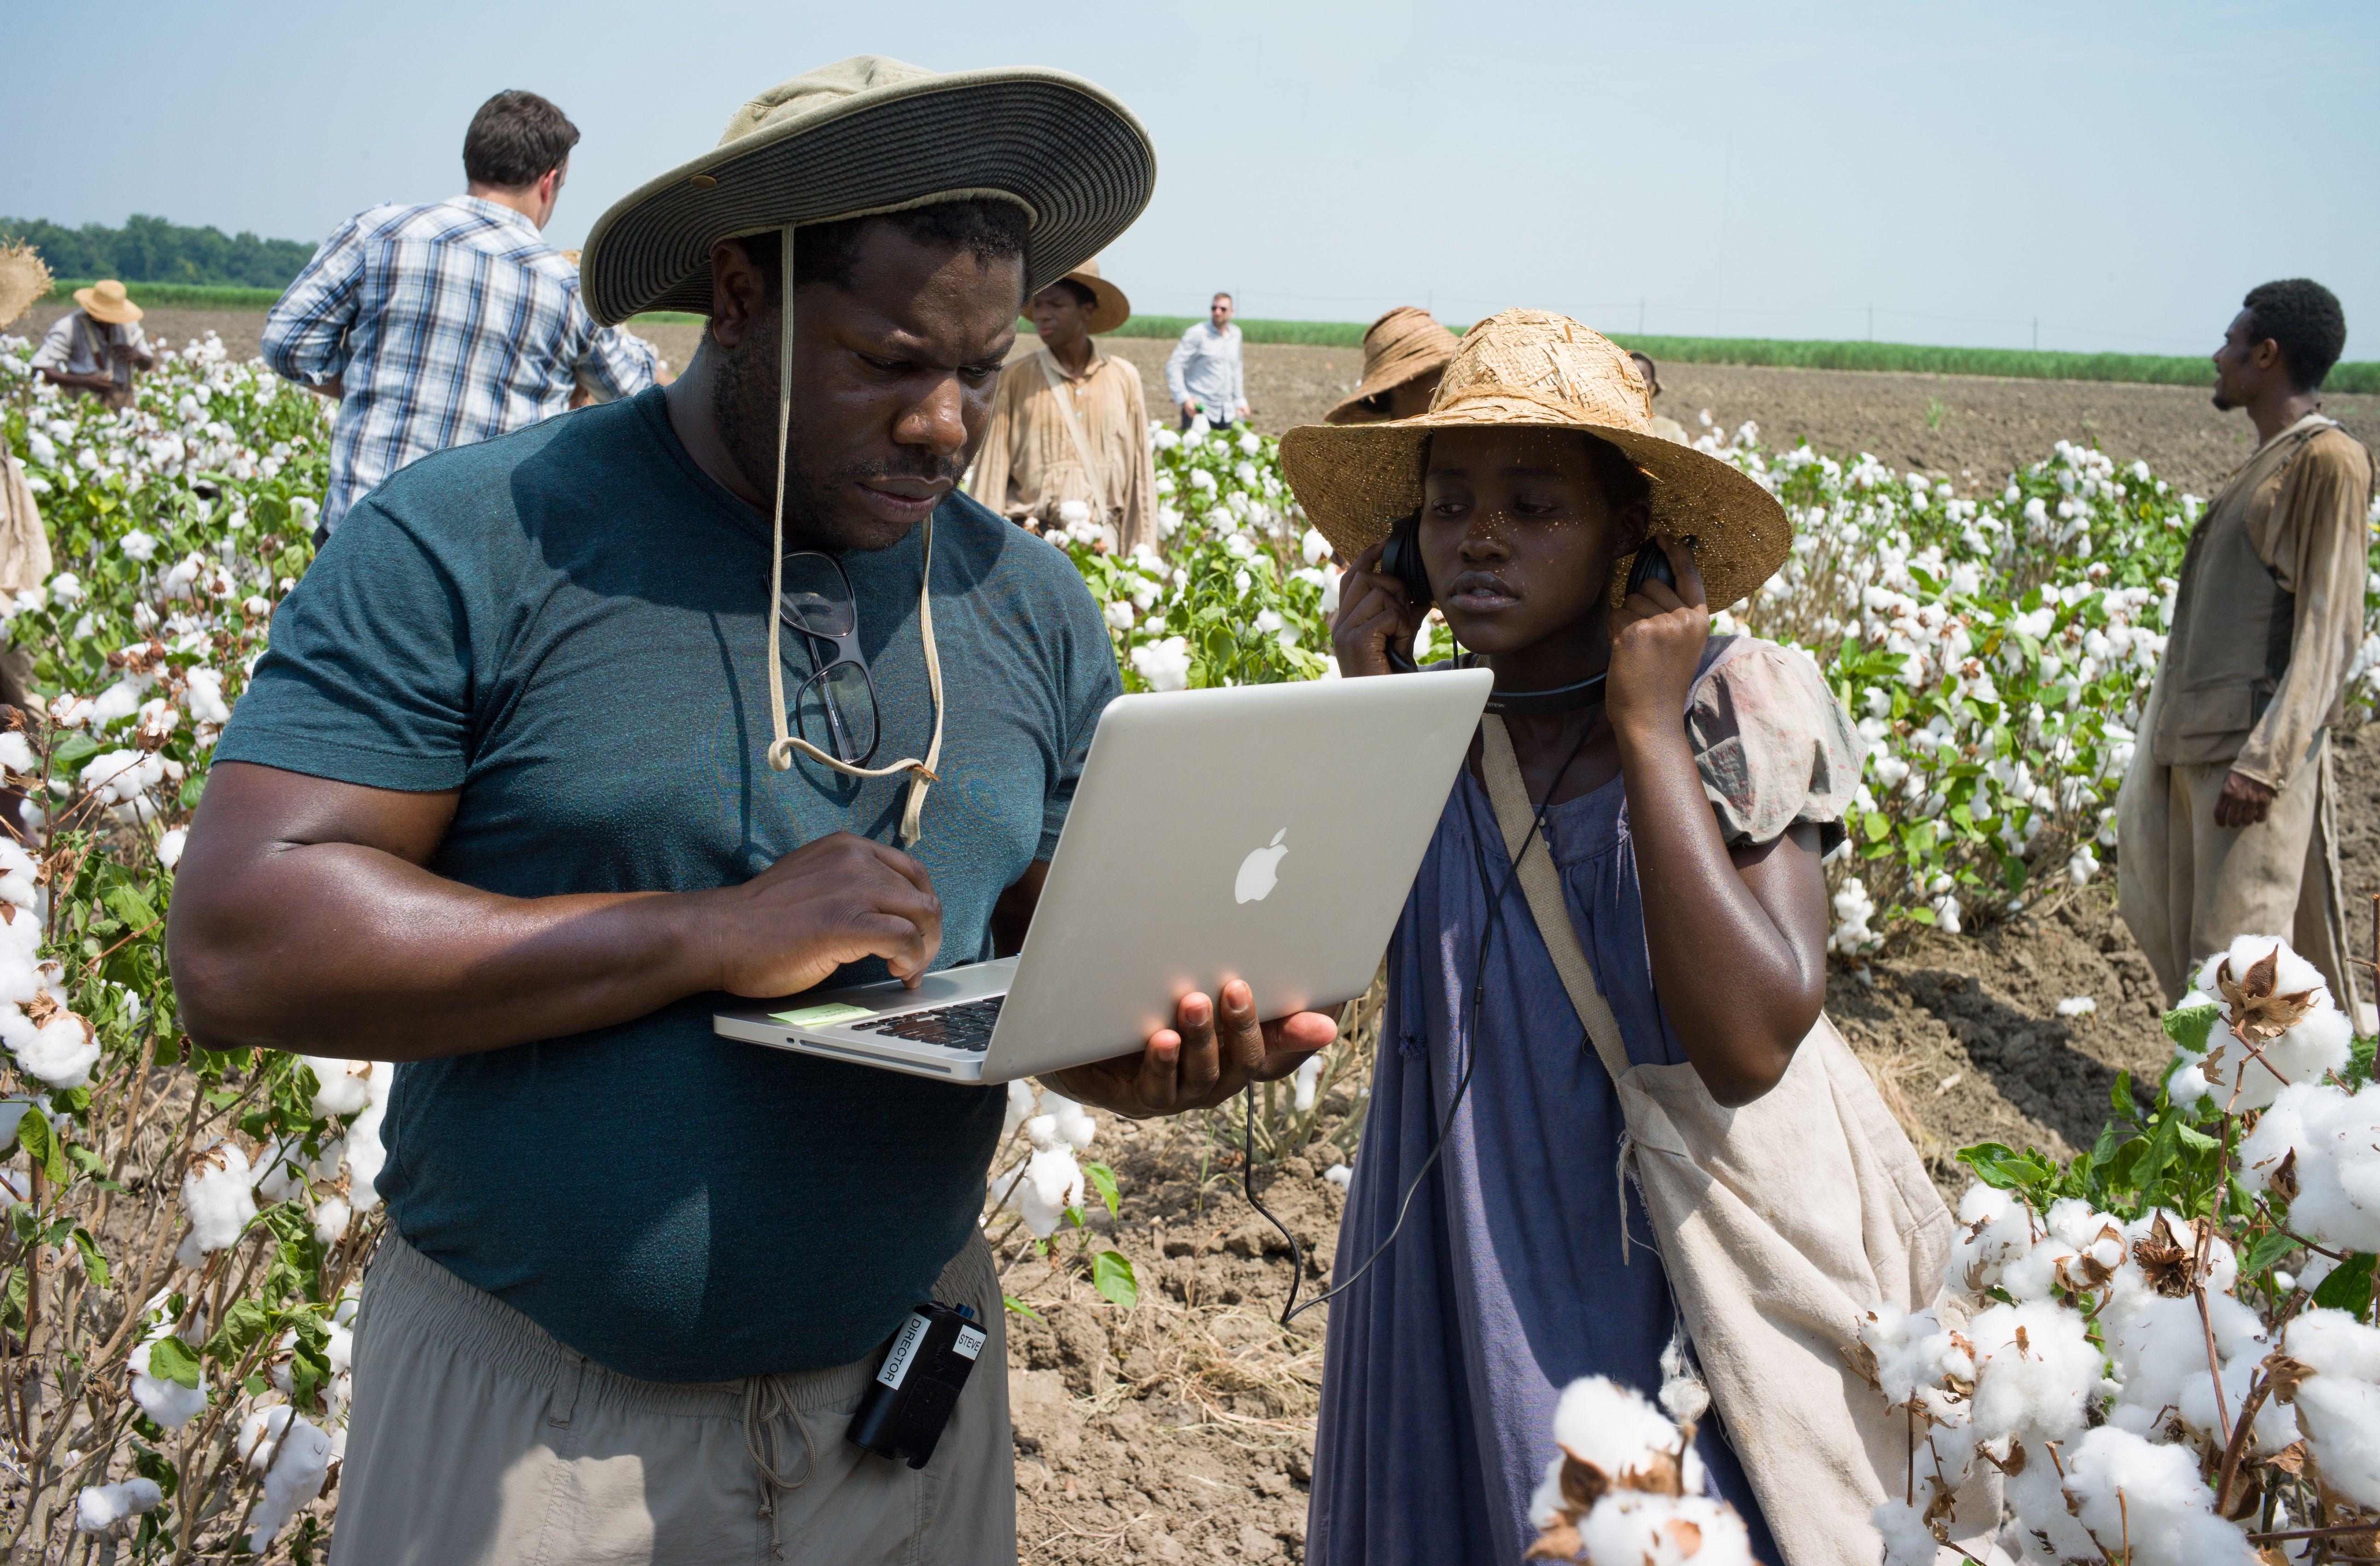 Steve McQueen behind the scenes 12 Years A Slave